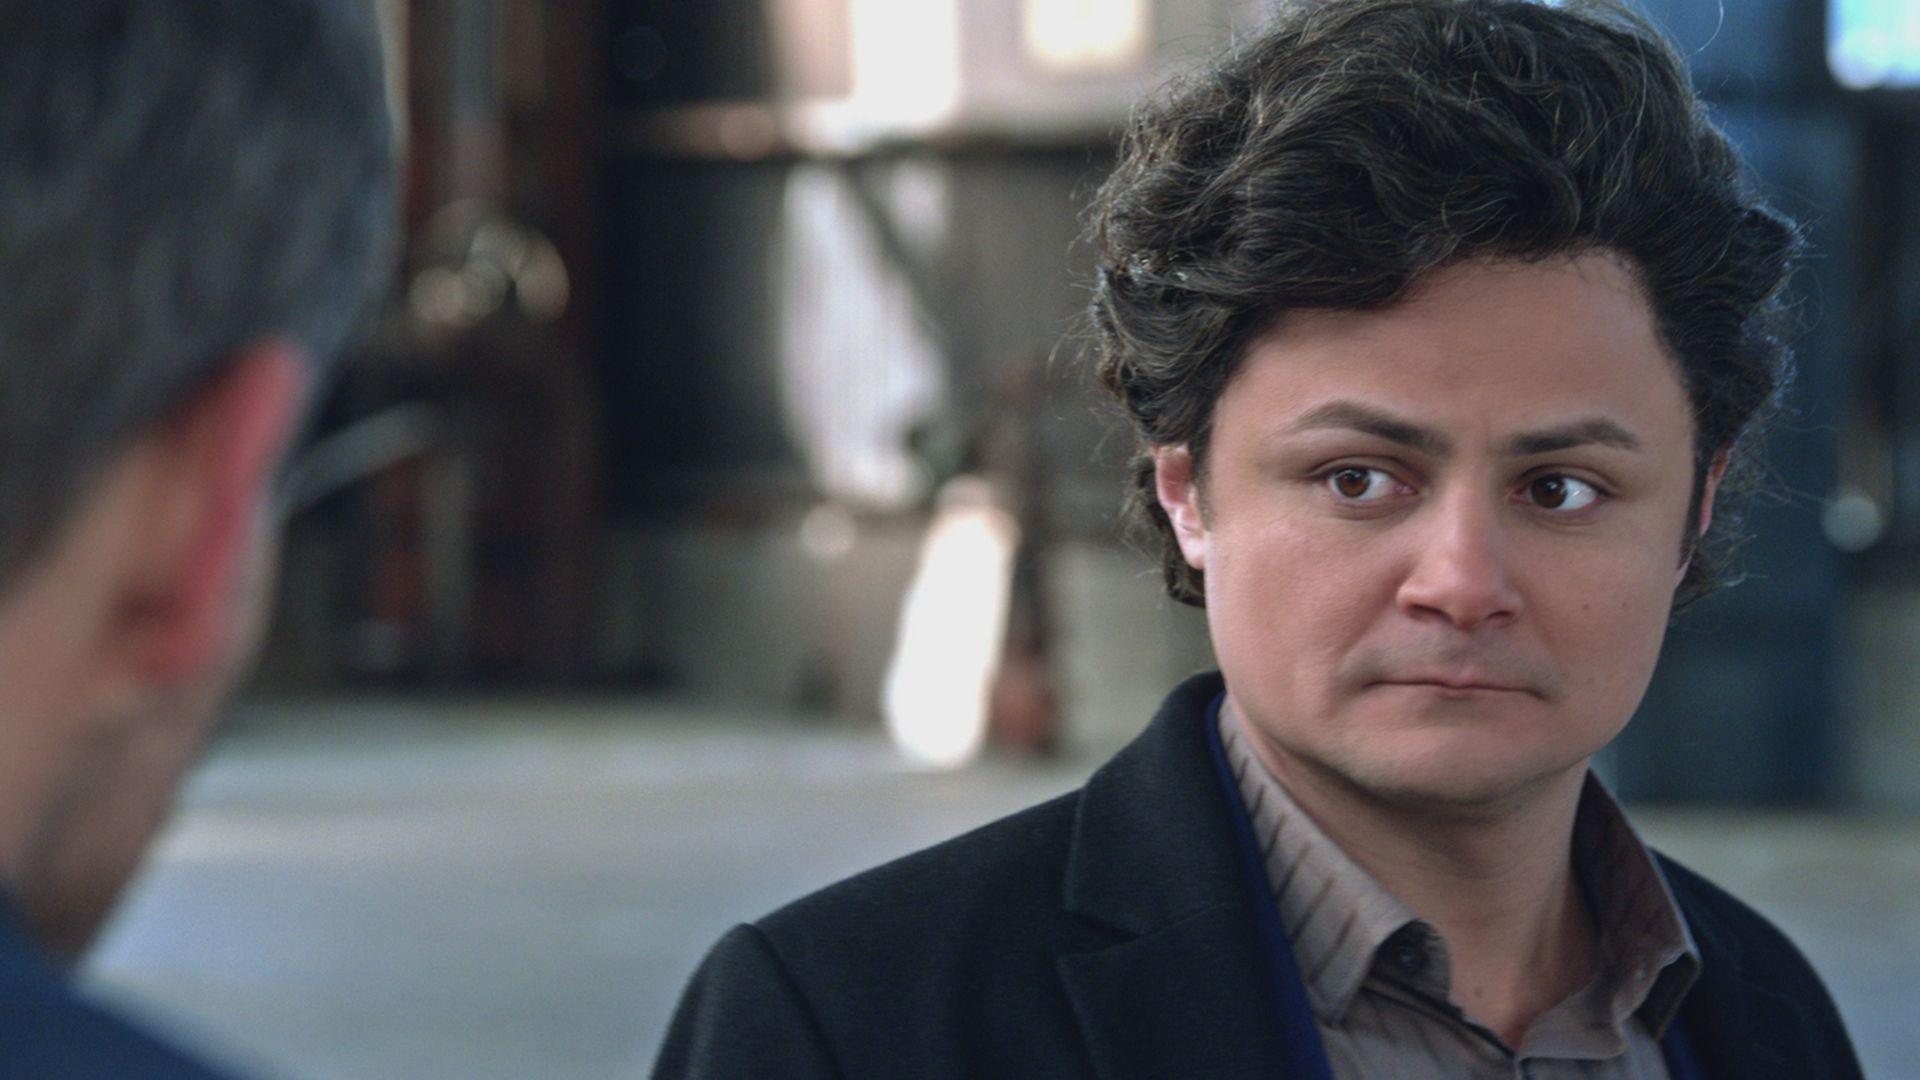 Highlight - The Translator - Alternatino with Arturo Castro (Video